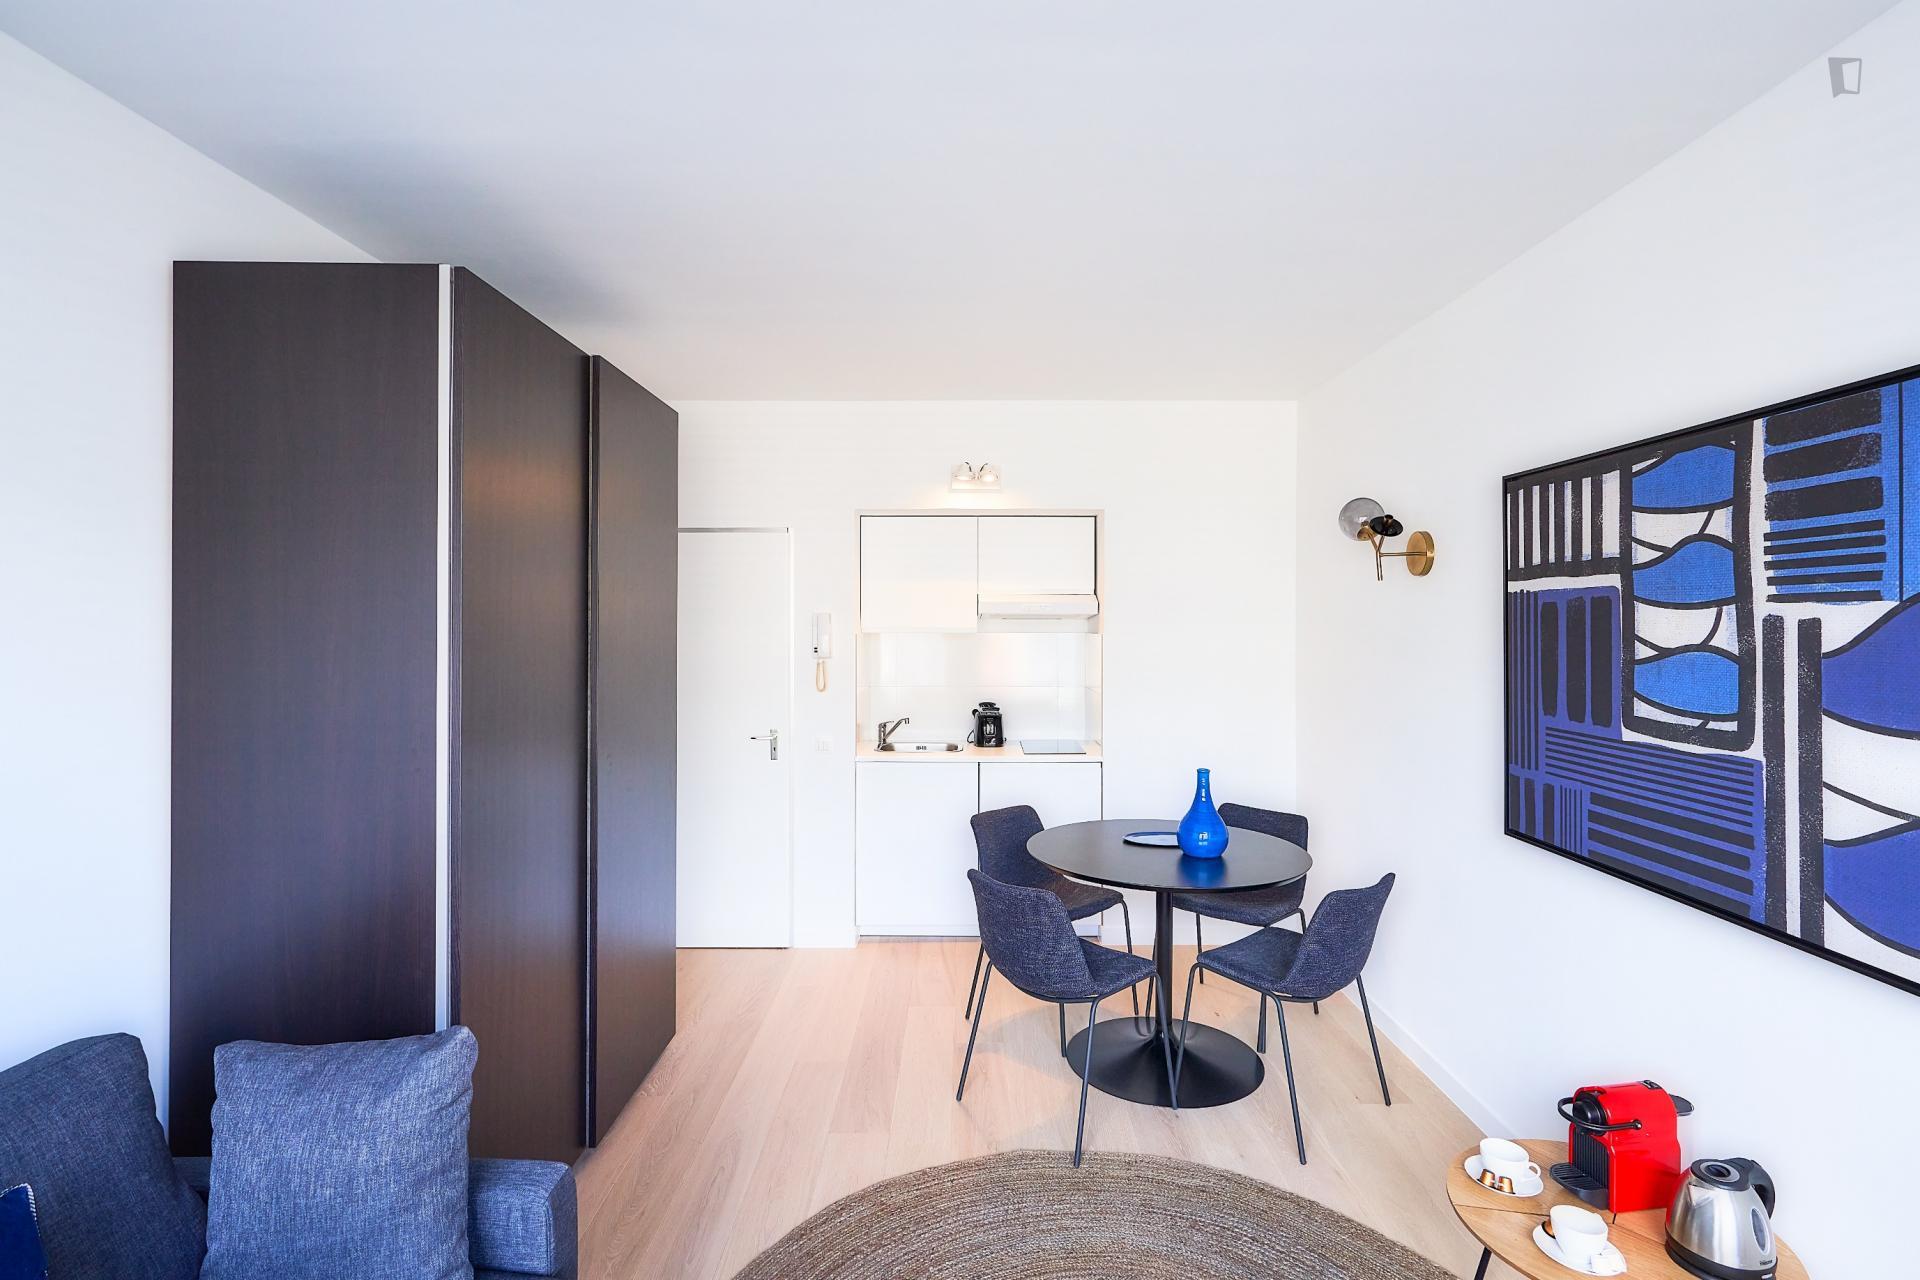 Blanche- Studio apartment for expats in Belgium